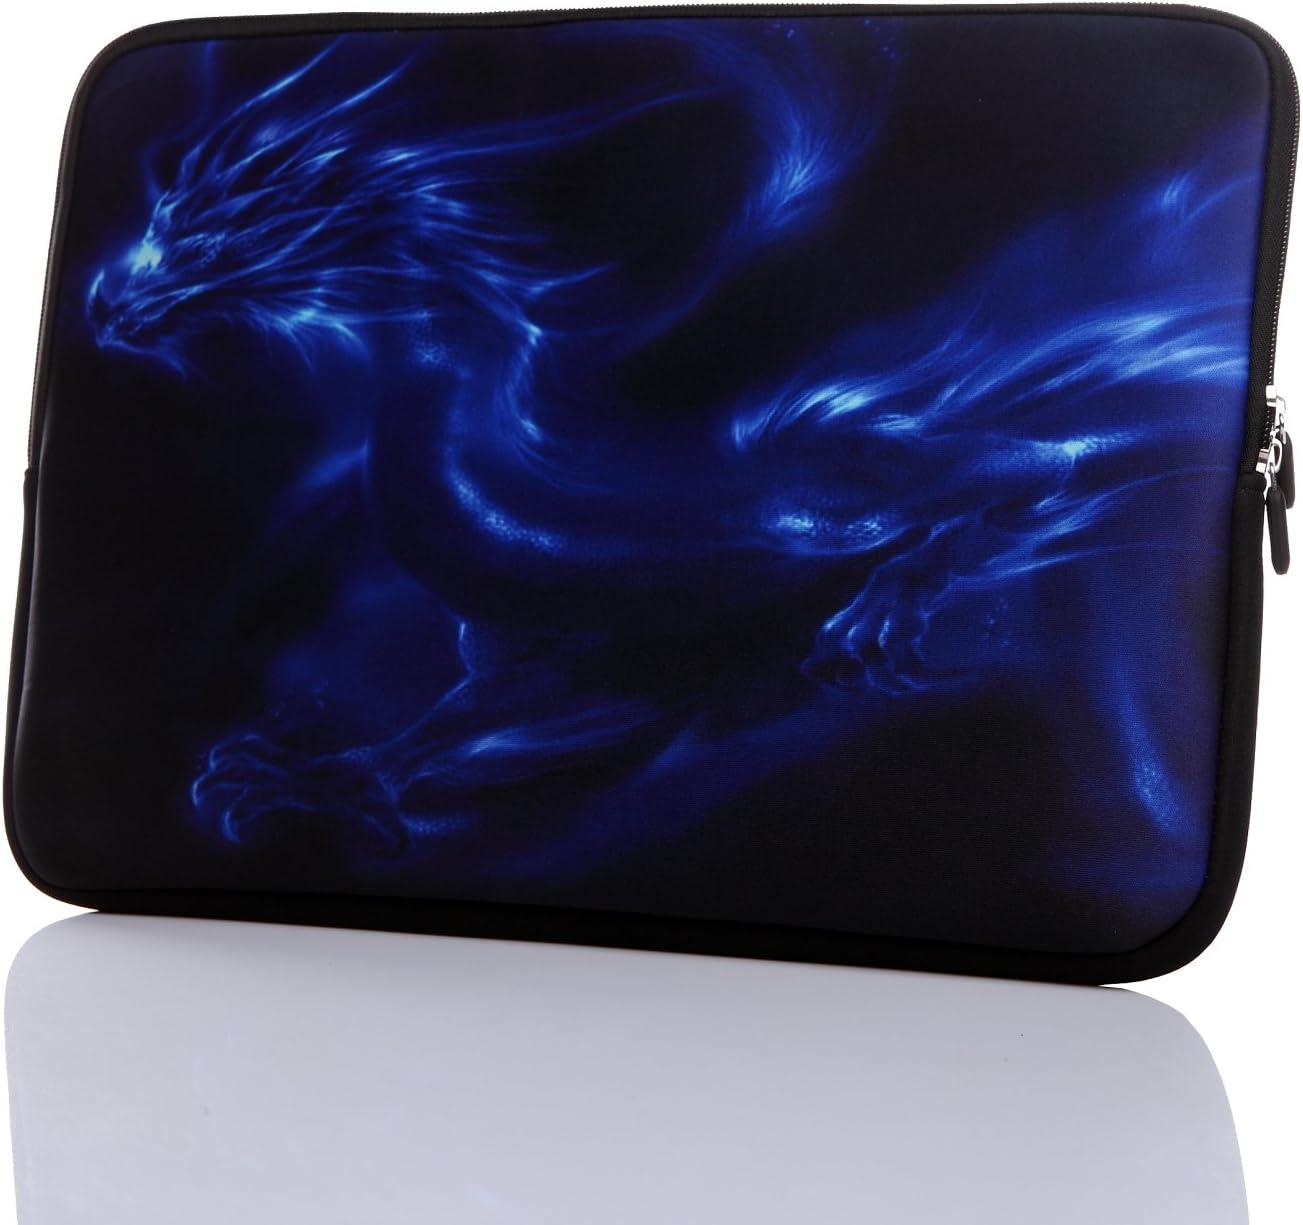 "11.6-Inch to 12.5-Inch Neoprene Laptop Sleeve Case with Hidden Handle for 11 11.6 12 12.2 12.5"" Inch Men Women MacBook/Tablet/Netbook (11.6-12.5 Inch, Blue Dragon)"